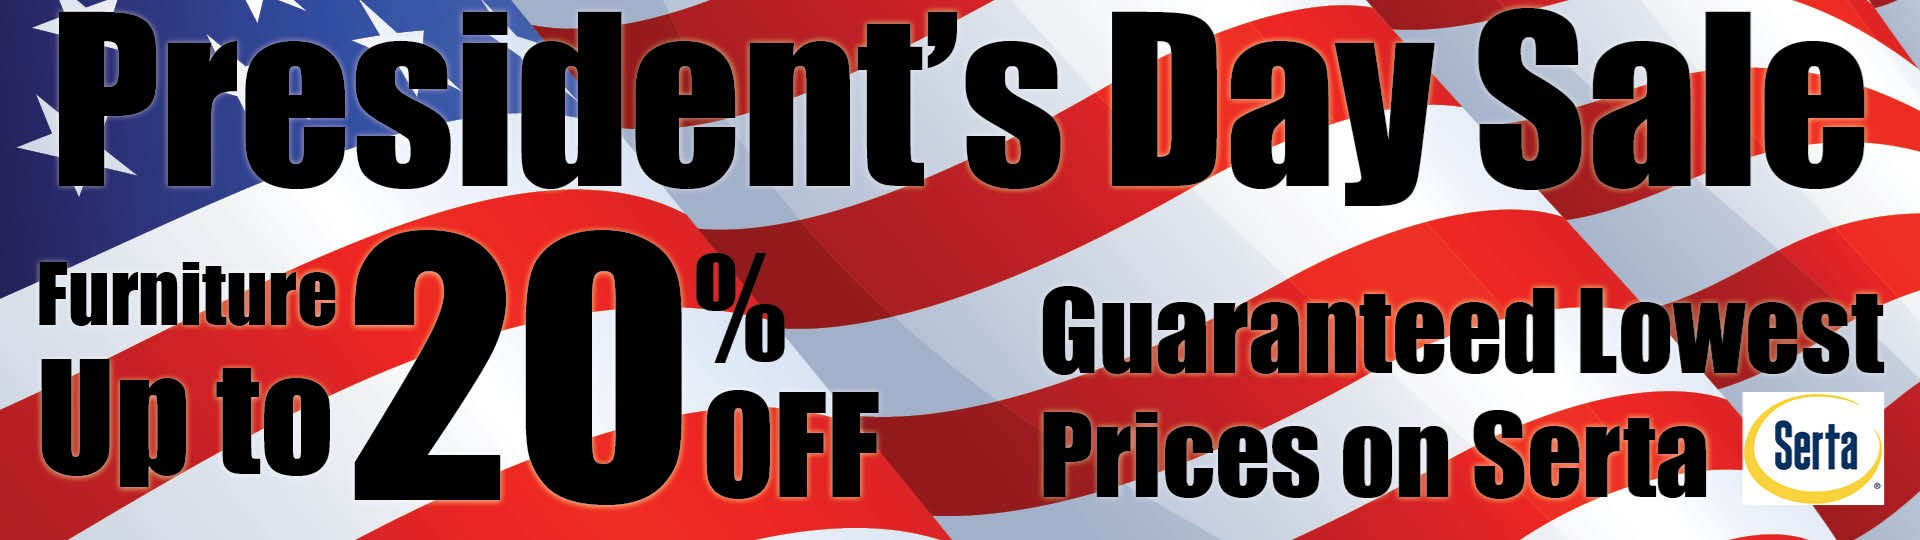 Presidents Day, Sale, Deal, Furniture, Mattress